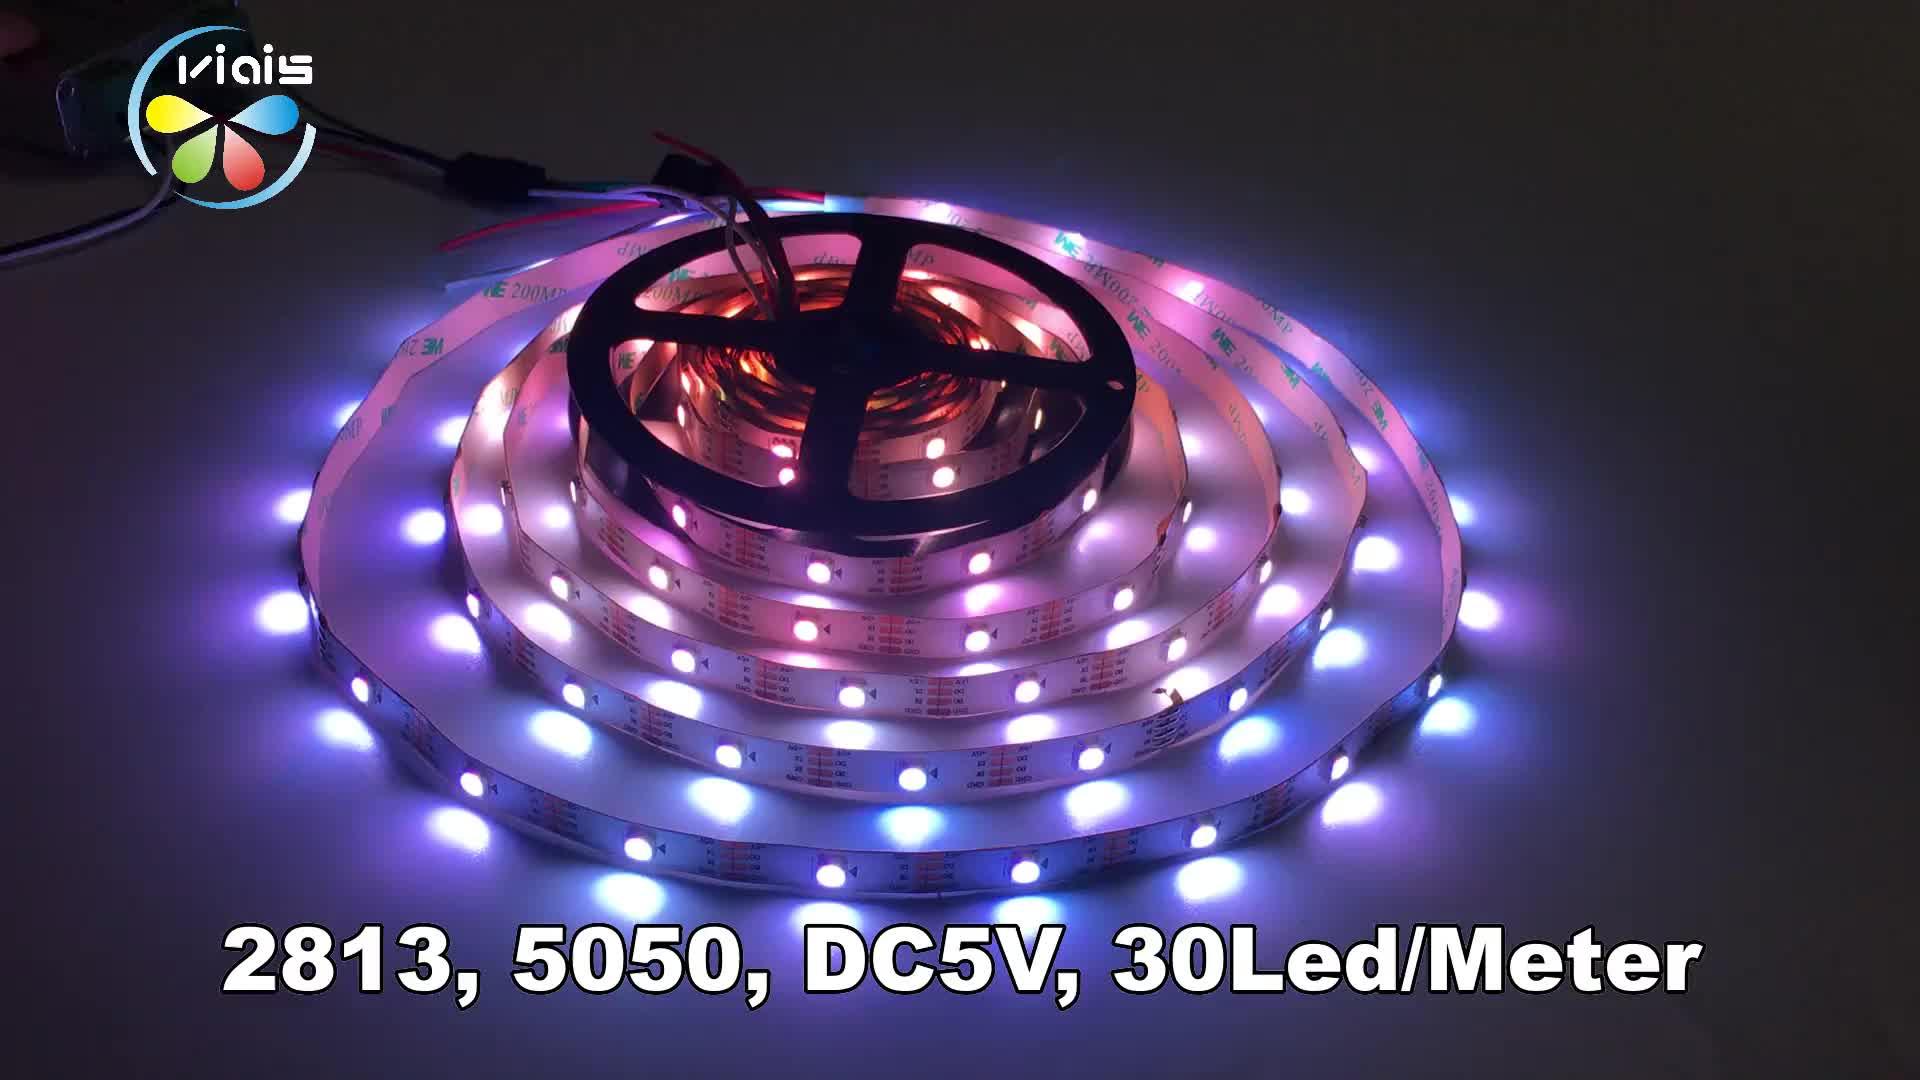 Viais Fabrikant Programmeerbare Adresseerbare 5 V Flexibele Waterdichte WS2812B Smd 5050 RGB Licht Led Strip